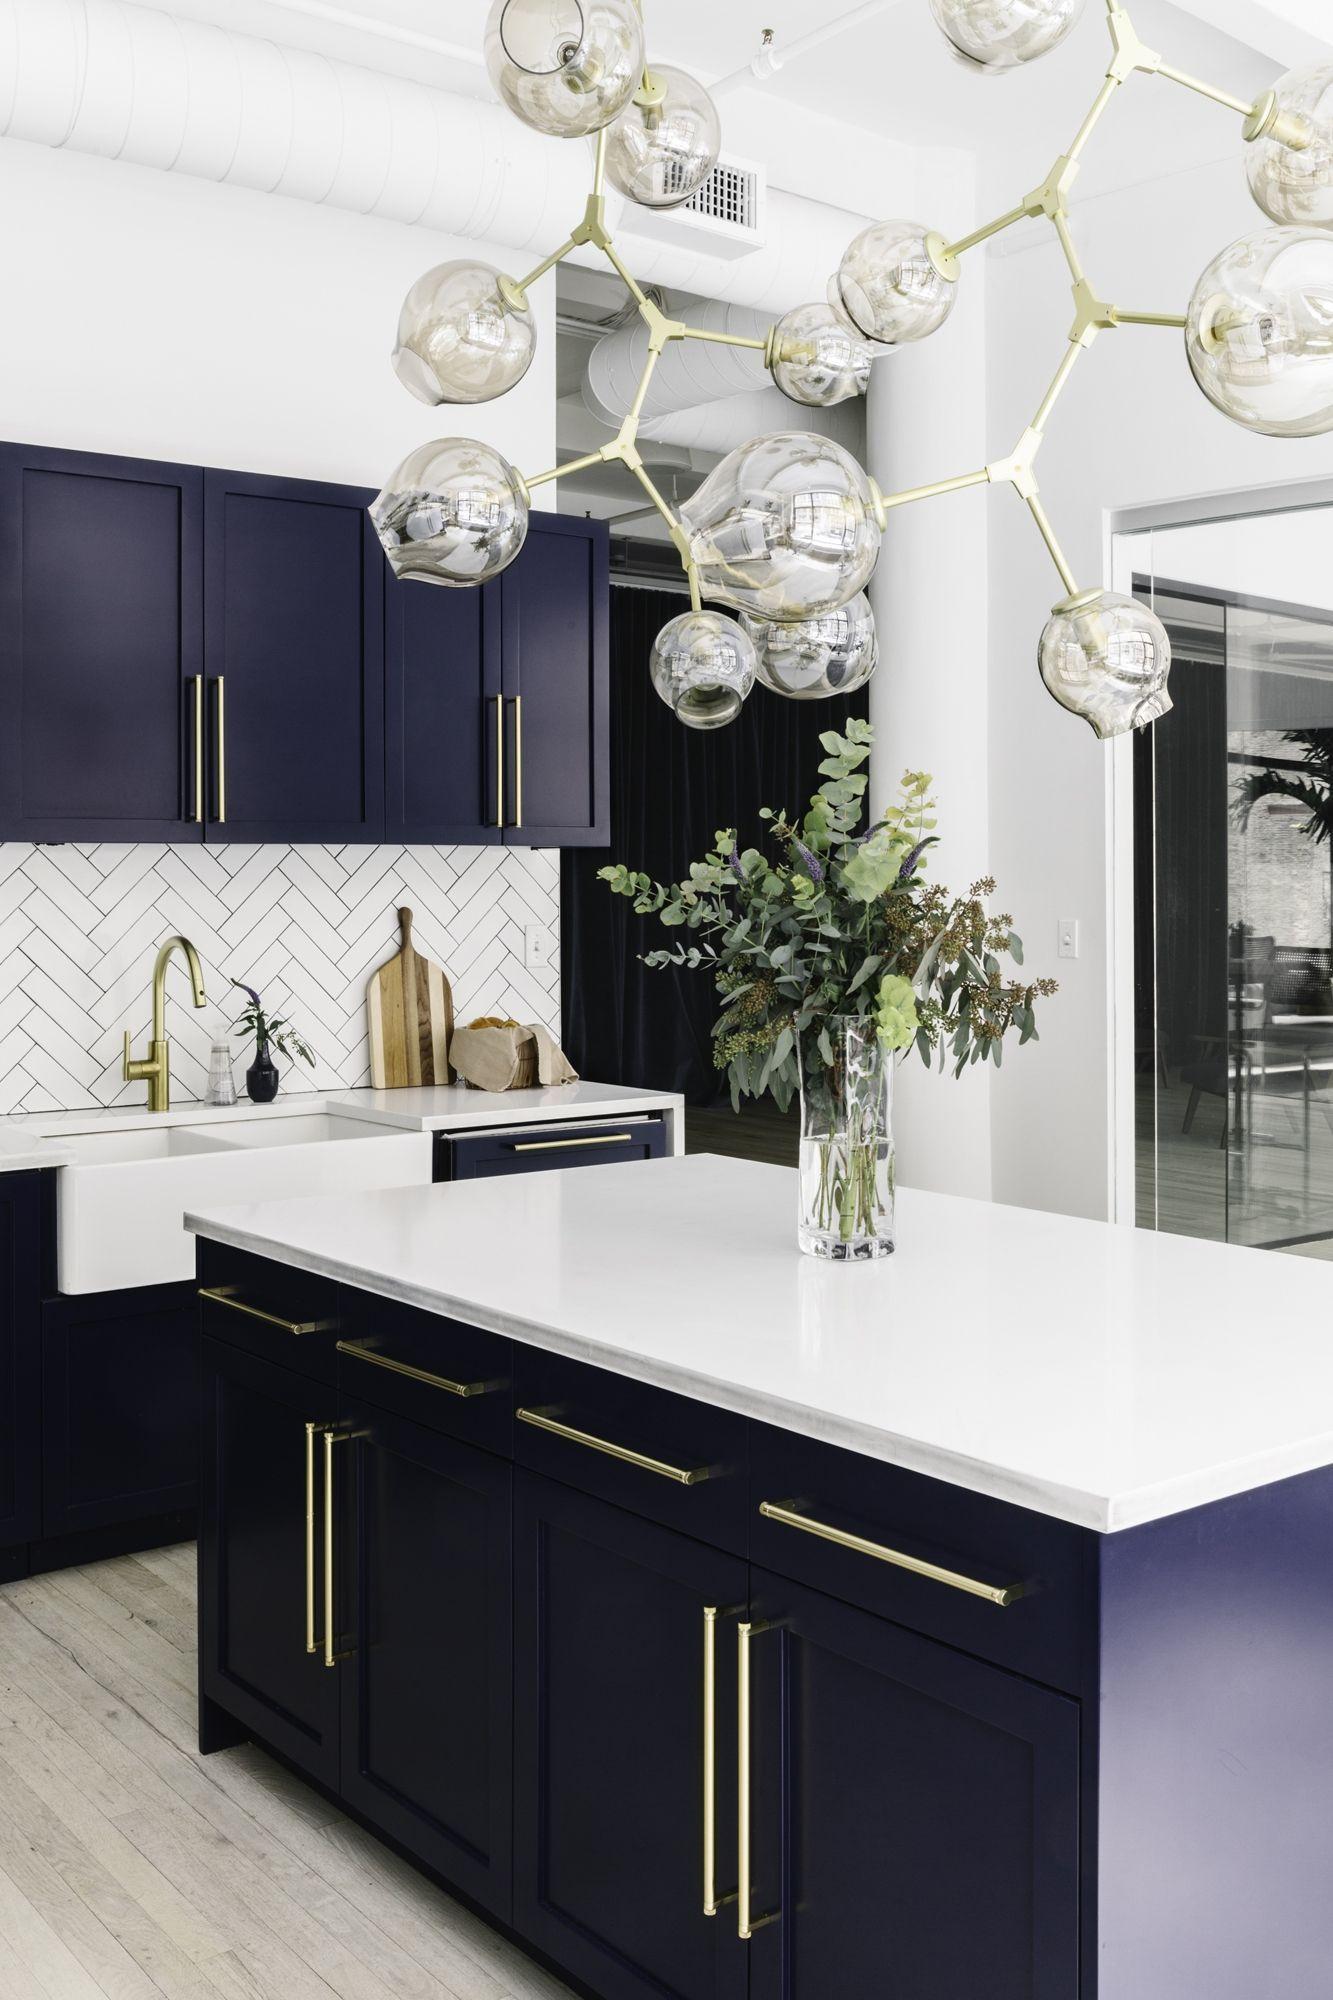 Trend Alert Add Mid Century Lamps To Your Kitchen Decor Design Interior